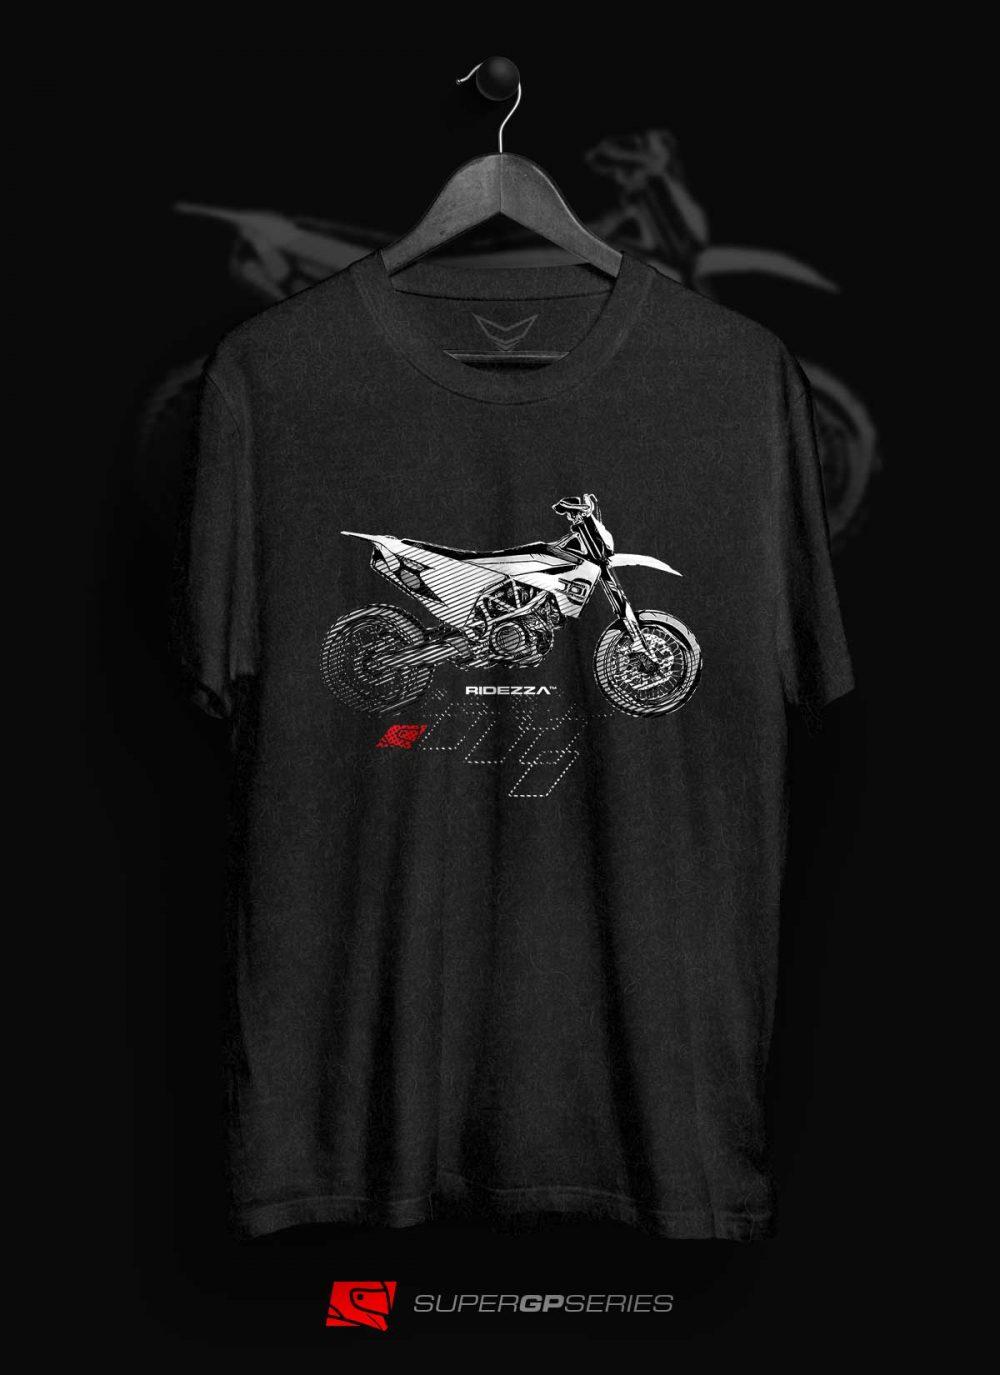 Ridezza Husqvarna 710 SuperGP Series T-Shirt